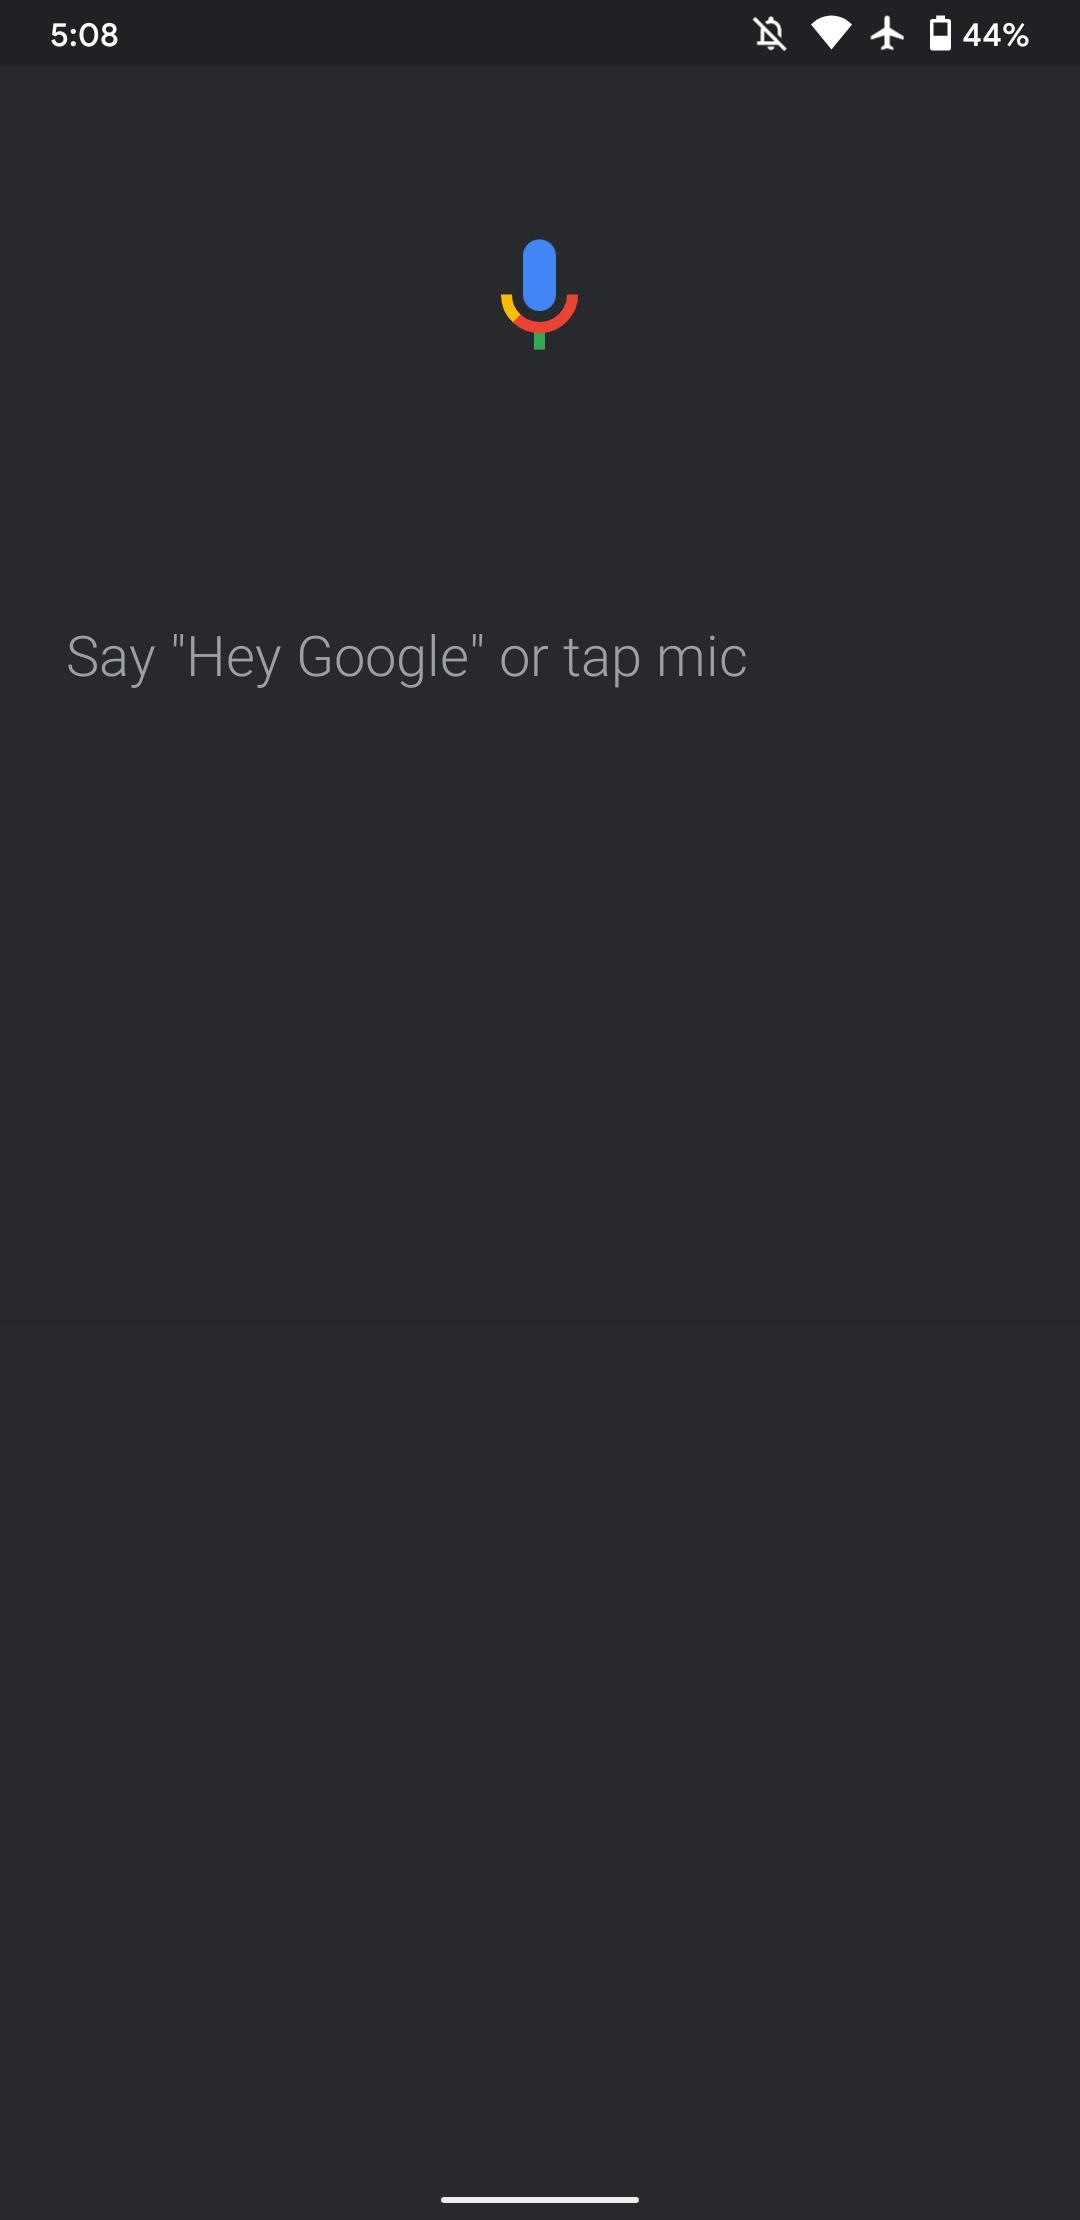 جستجوی صوتی گوگل